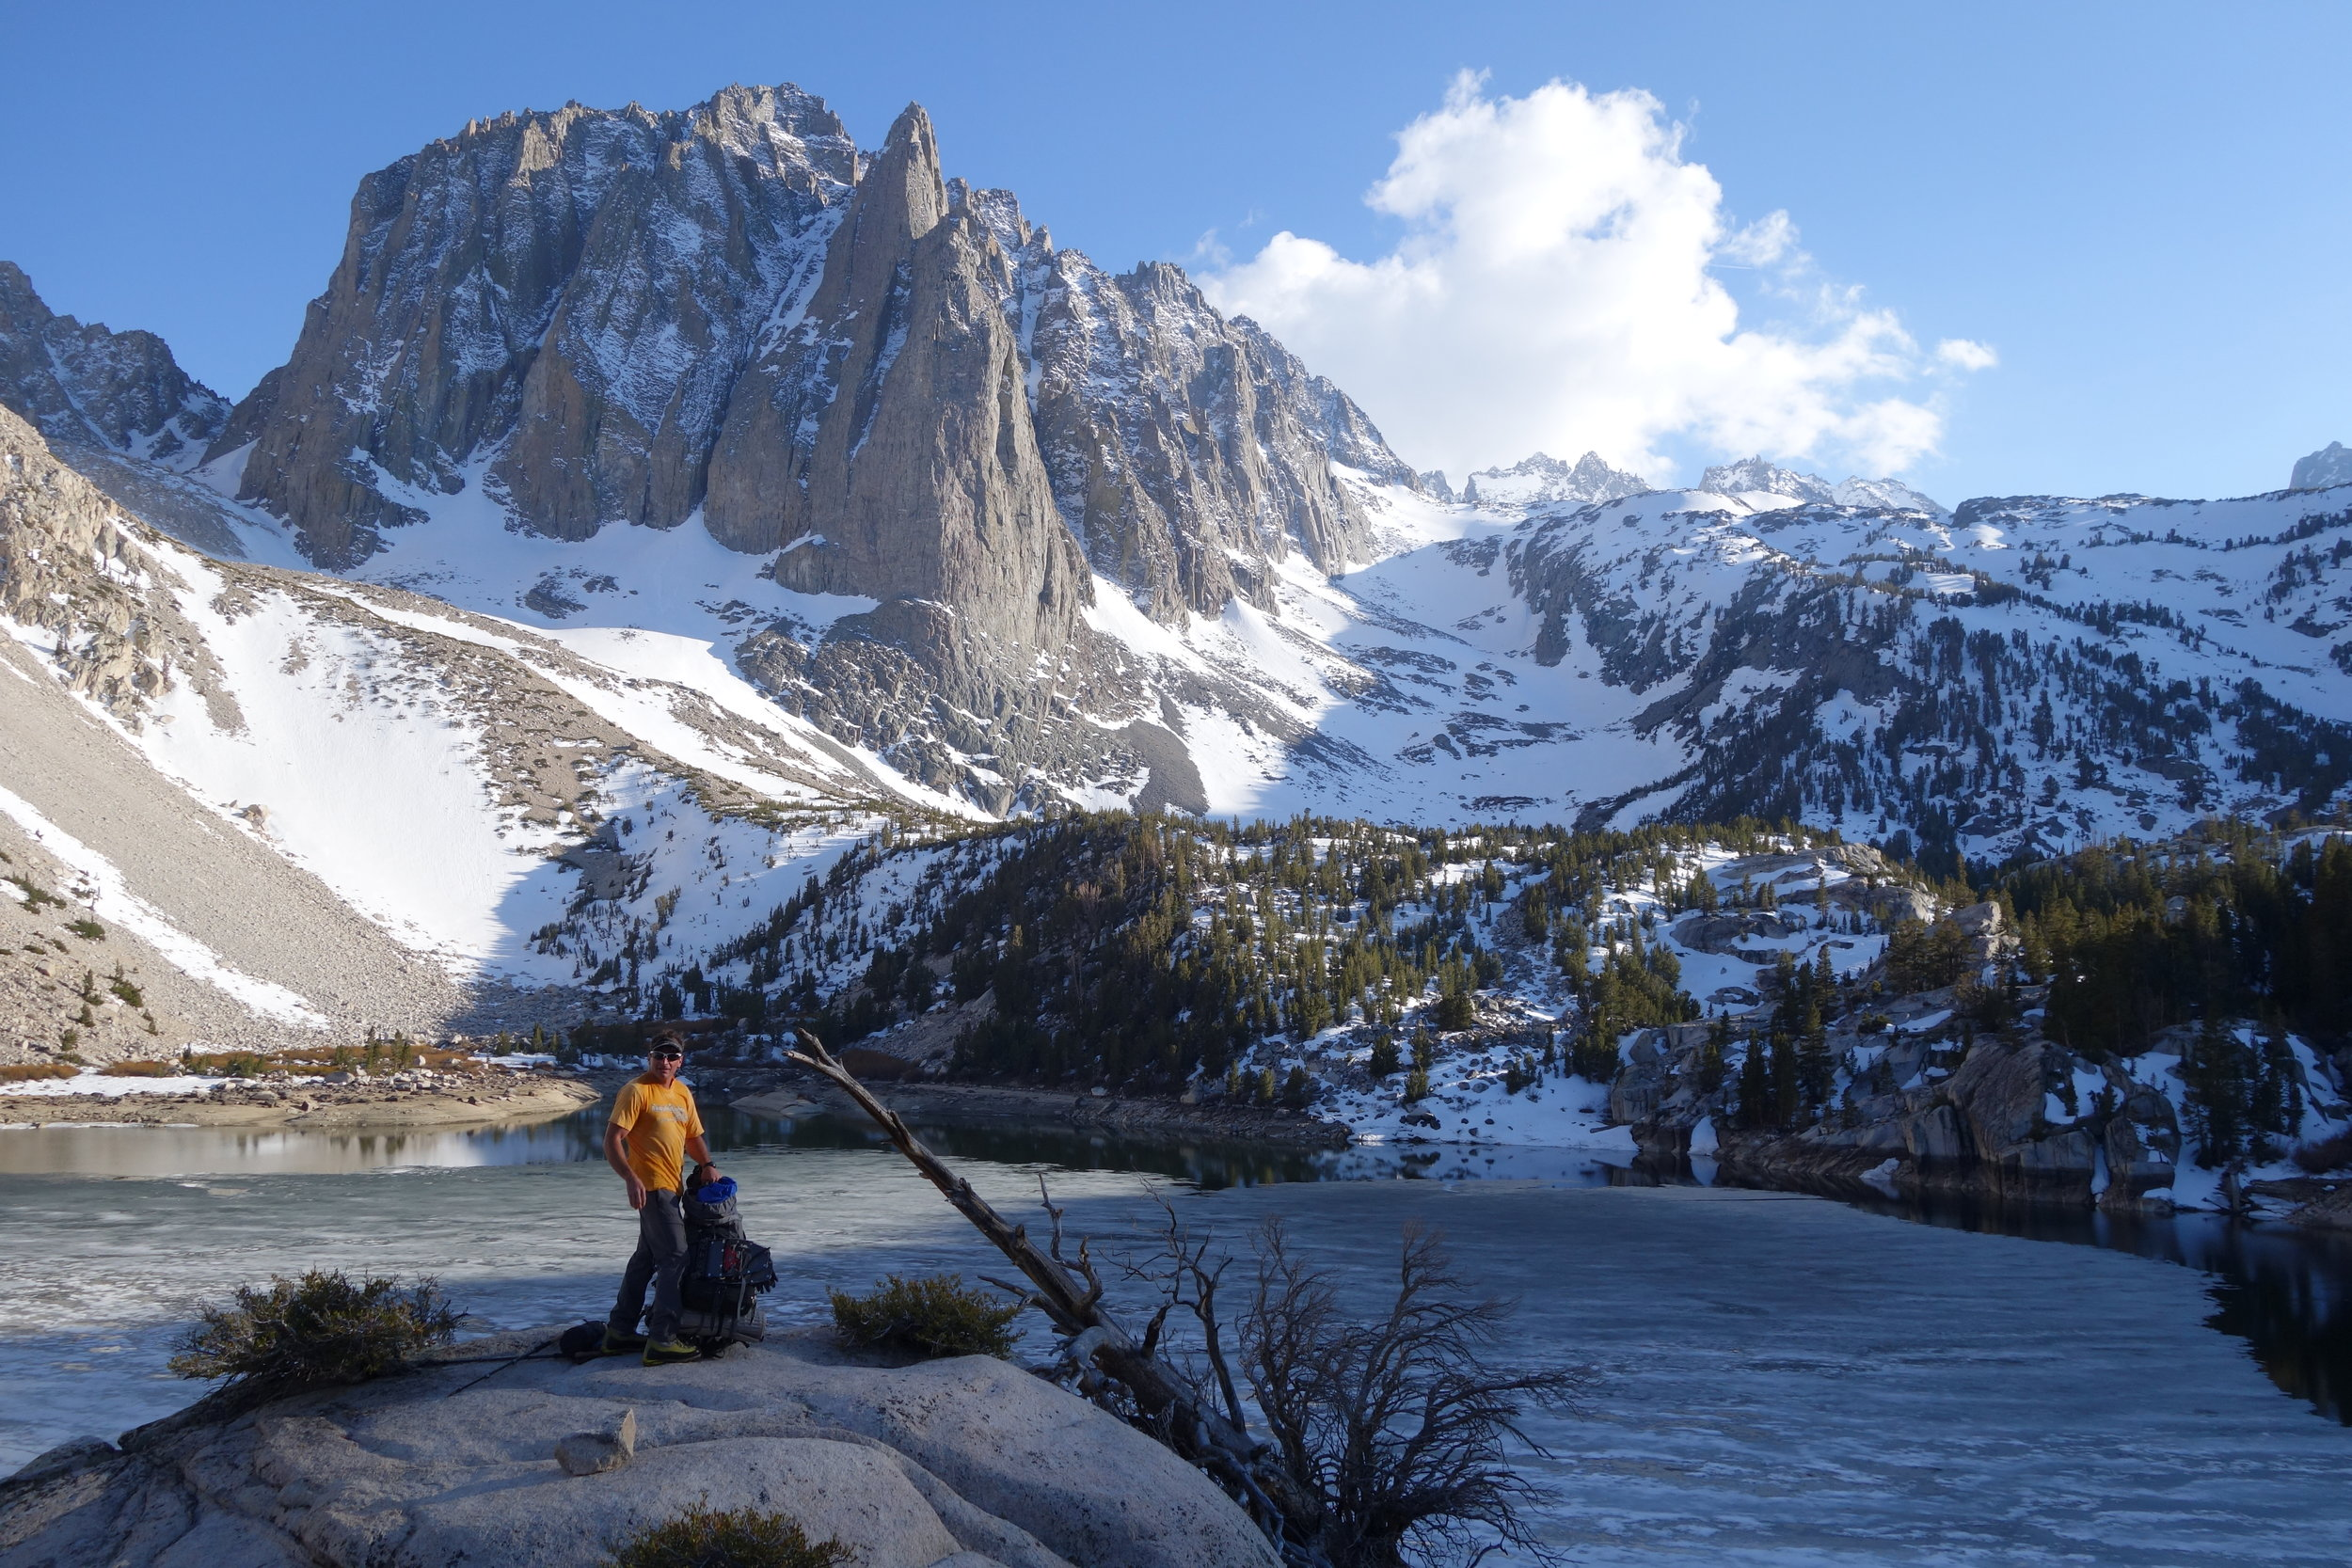 Palisades Lakes, eastern Sierra Nevada. Early season (mid-May).